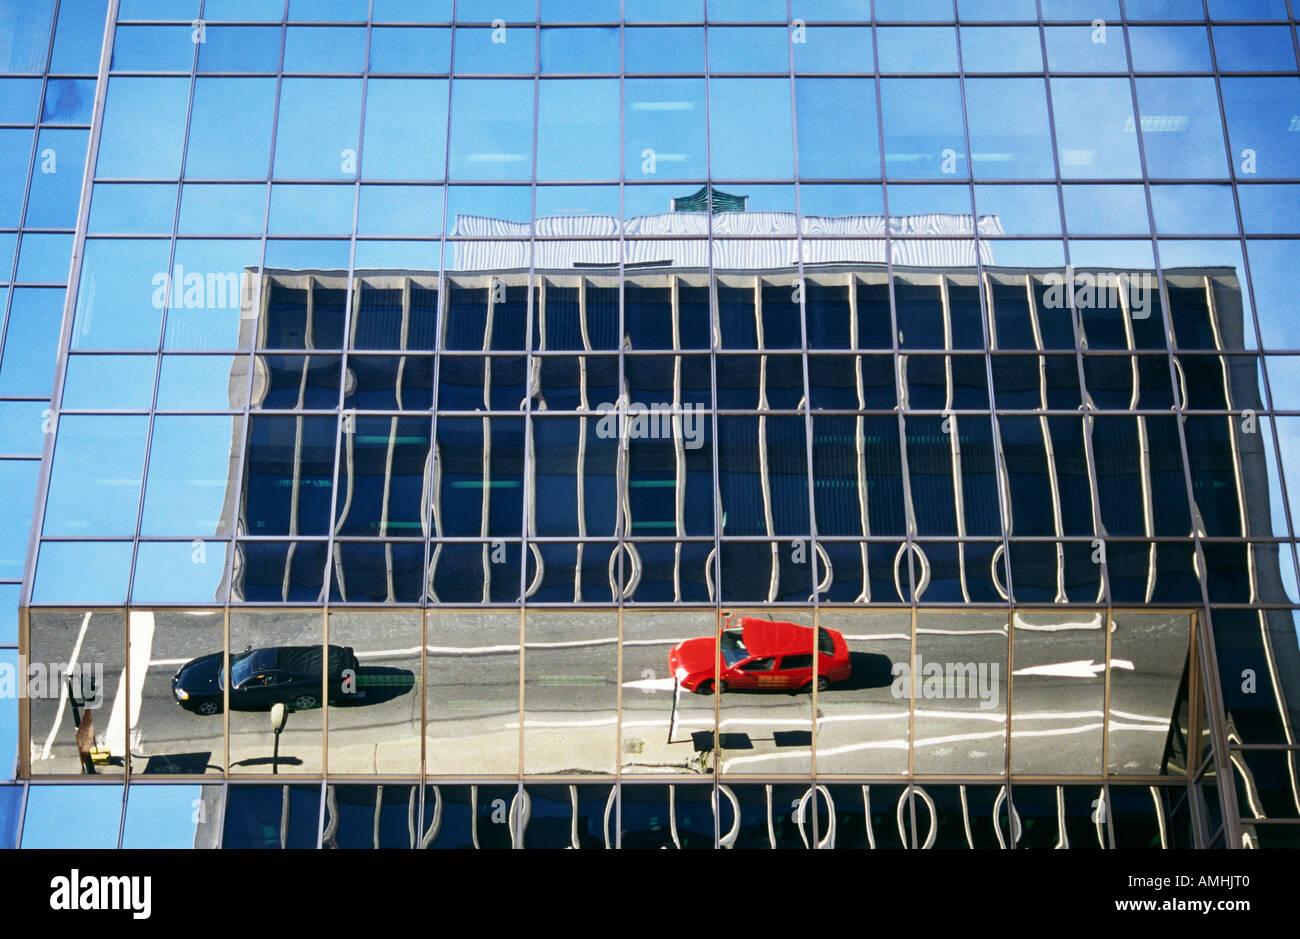 Street scene reflected in building window Montreal Quebec Canada Stock Photo